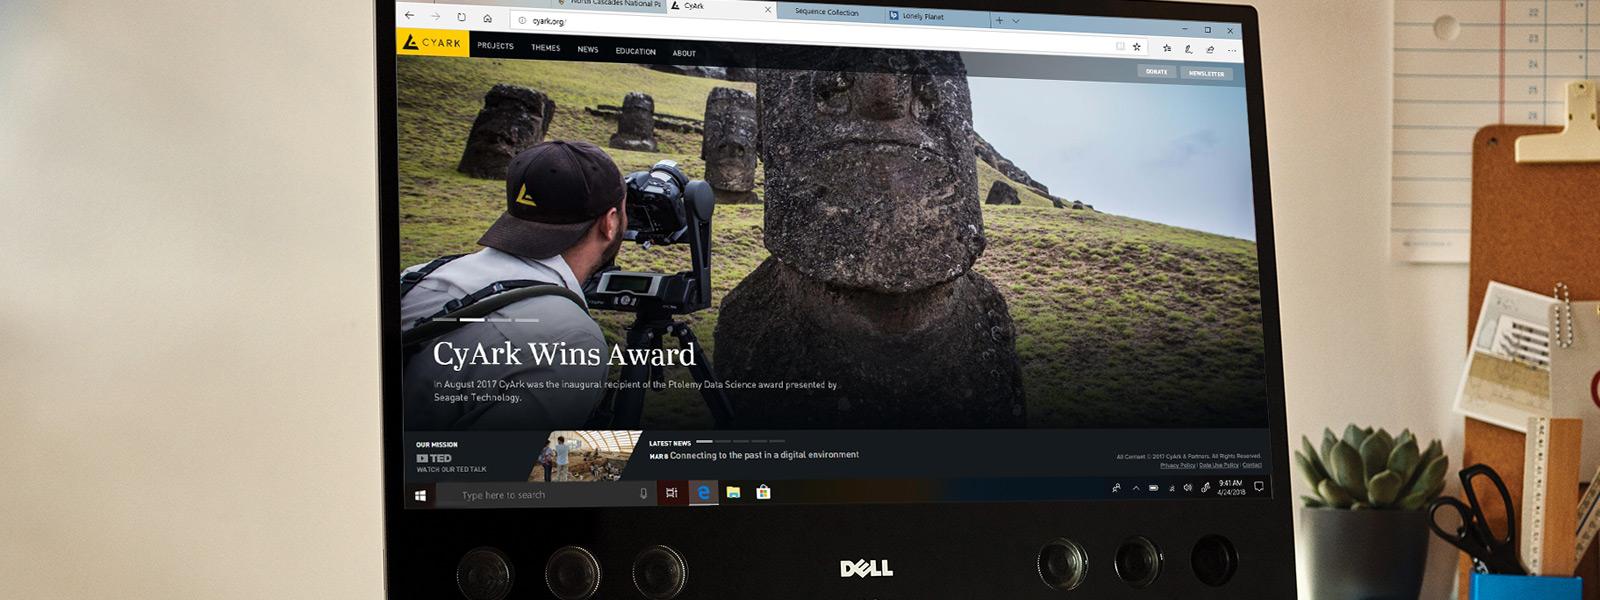 Monitor sobre un escritorio, con un explorador de Microsoft Edge que muestra un video 4K Ultra HD